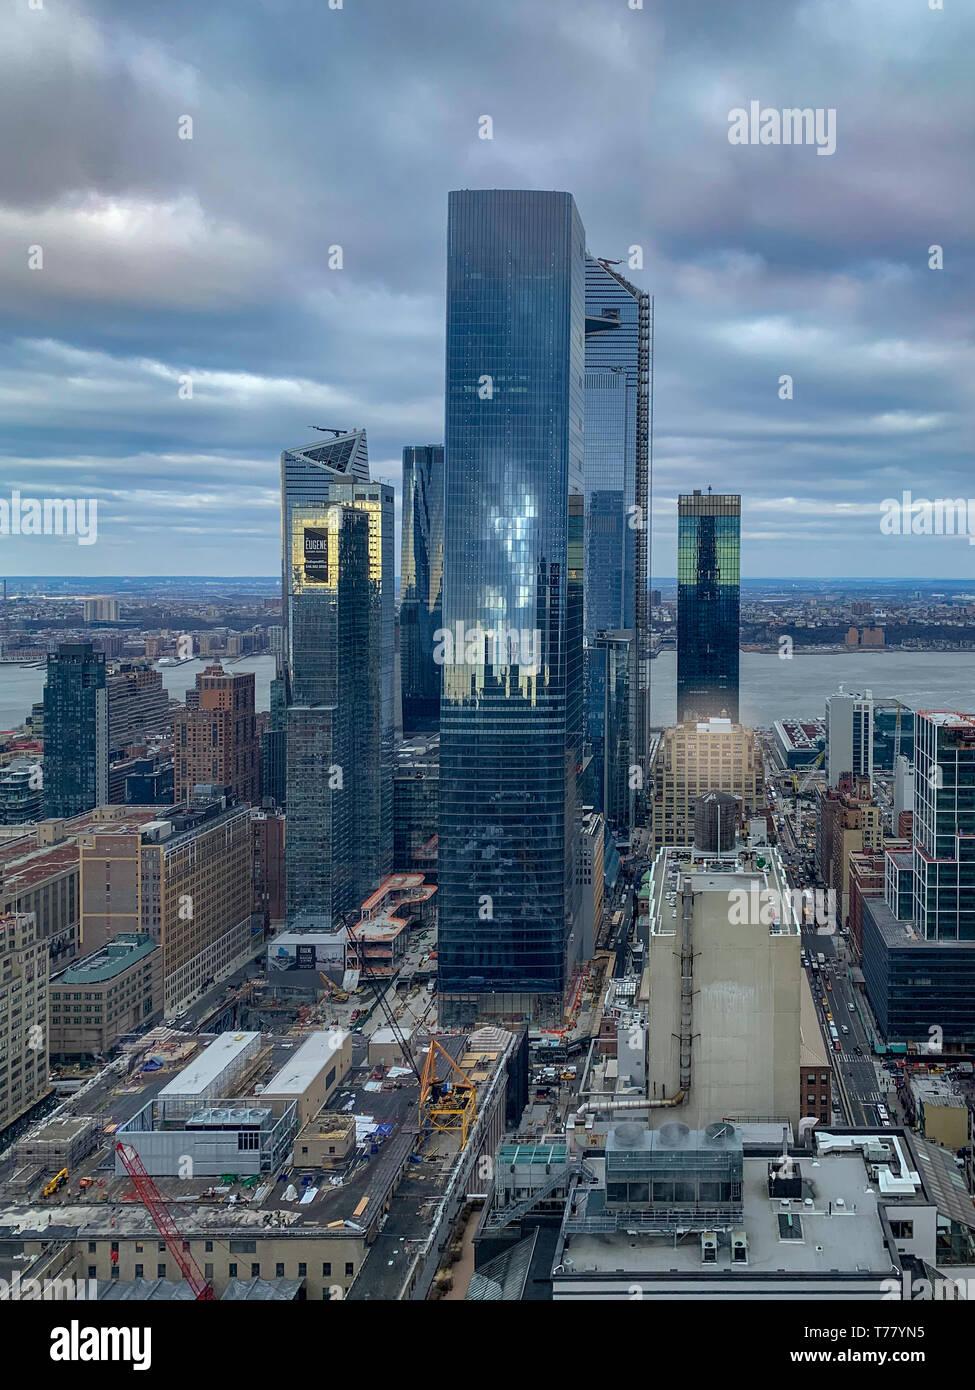 Hudson Yards skyscraper development in Midtown West, New York City Stock Photo